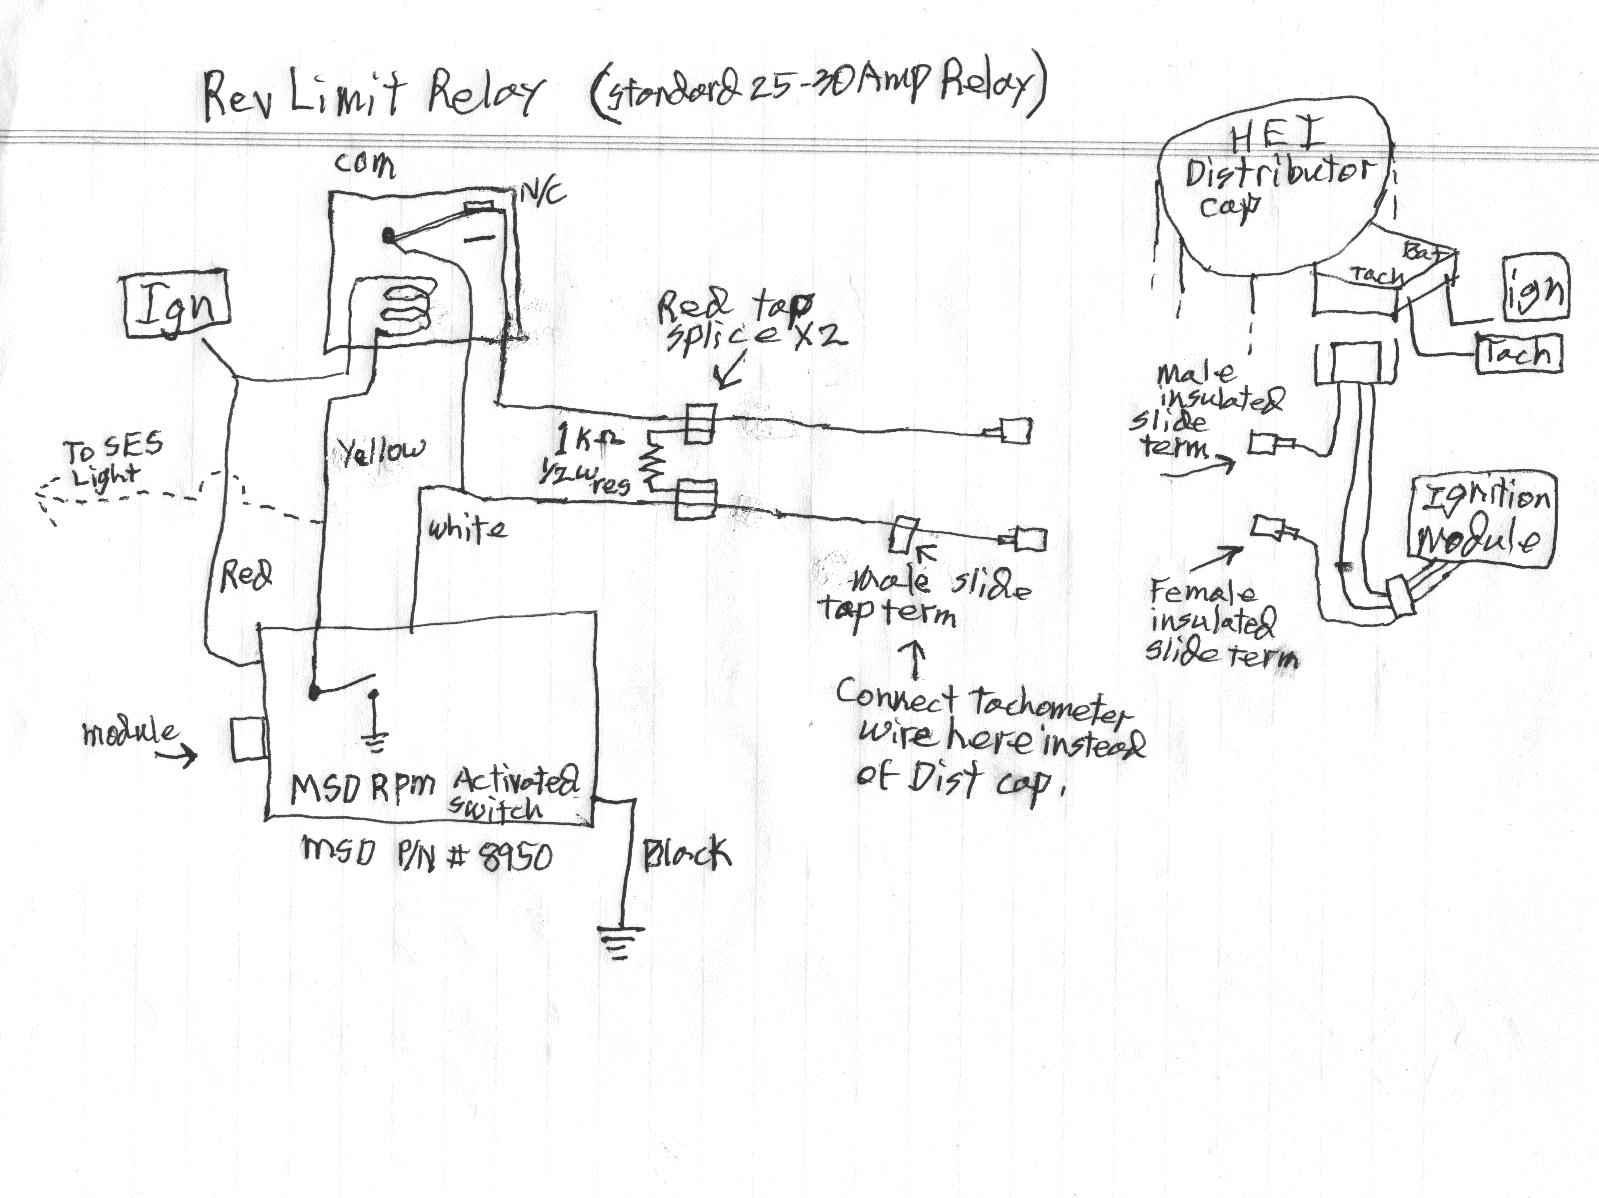 Chevy 350 Hei Distributor Wiring Diagram Lukaszmira Com And - Hei Distributor Wiring Diagram